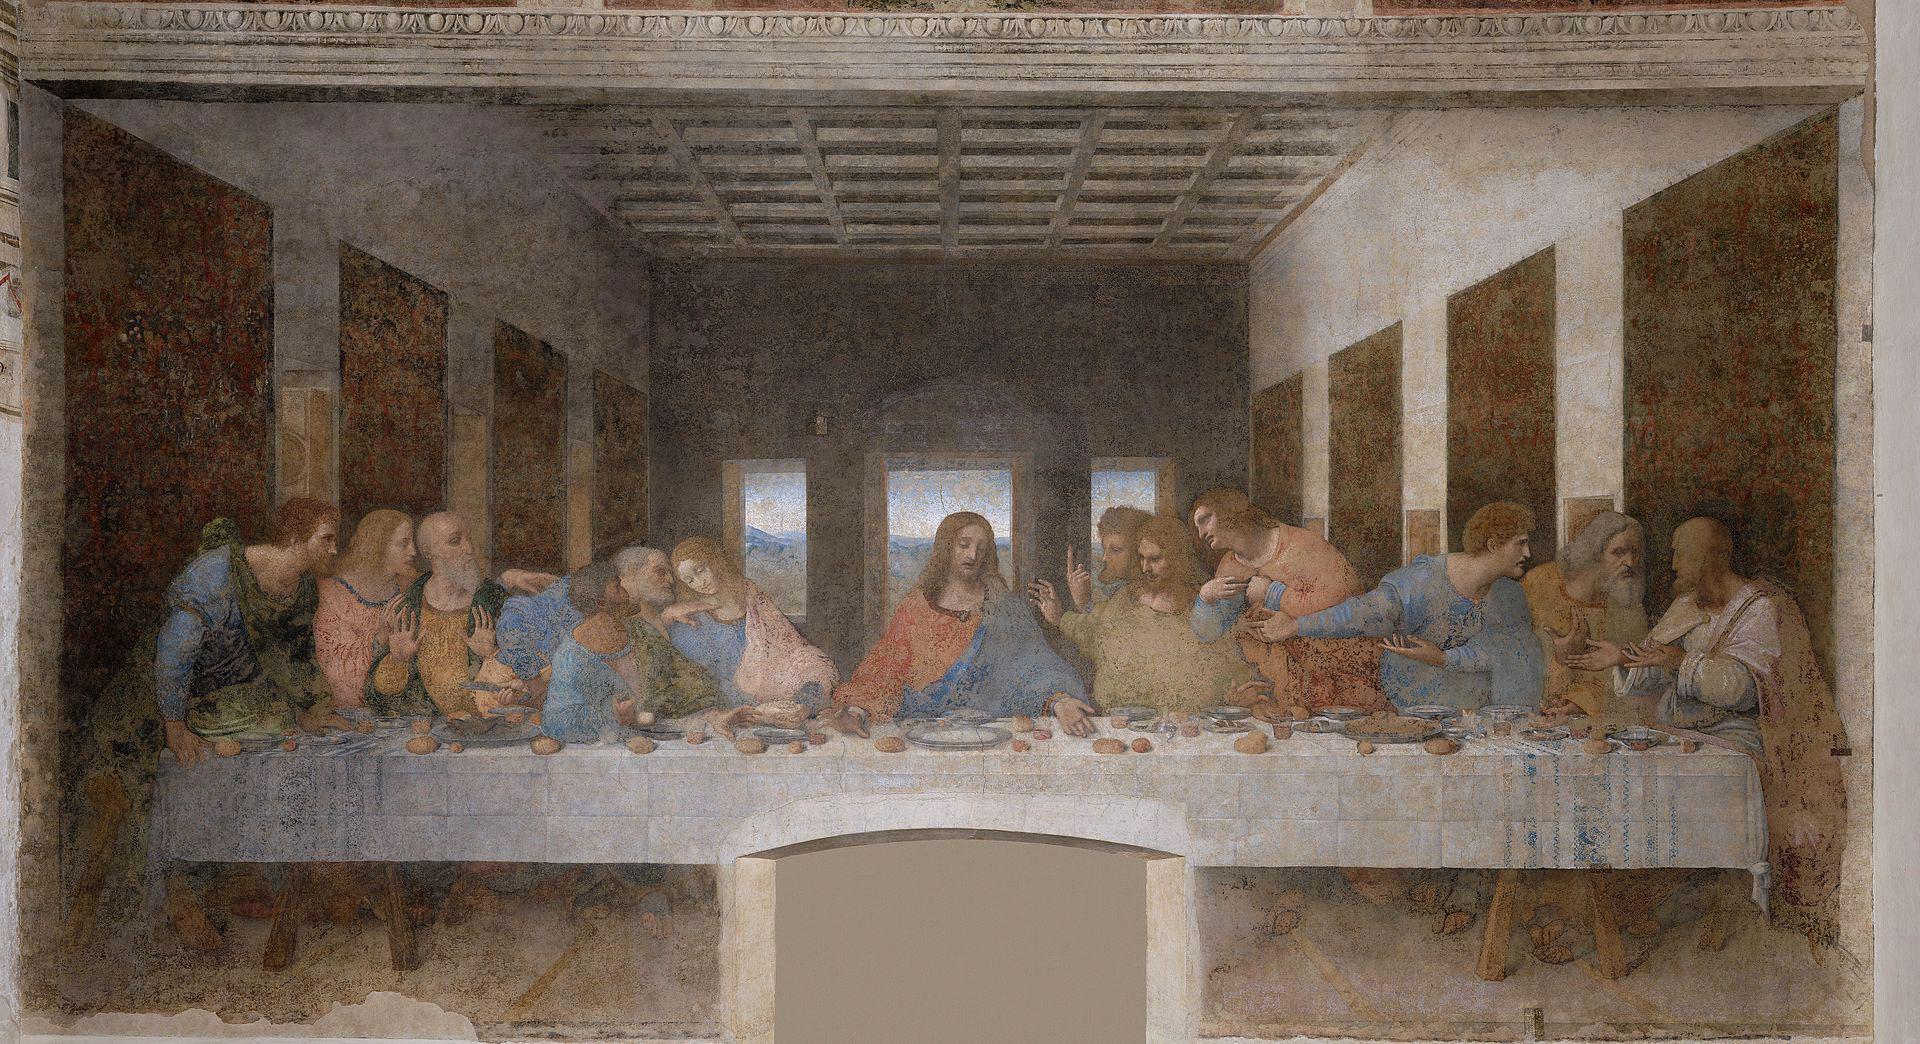 The Last Supper by Leonardo da Vinci, 1495-1498. Photographic reproduction: Copyright 2006-2007 HAL9000 S.r.l.  (Public domain)